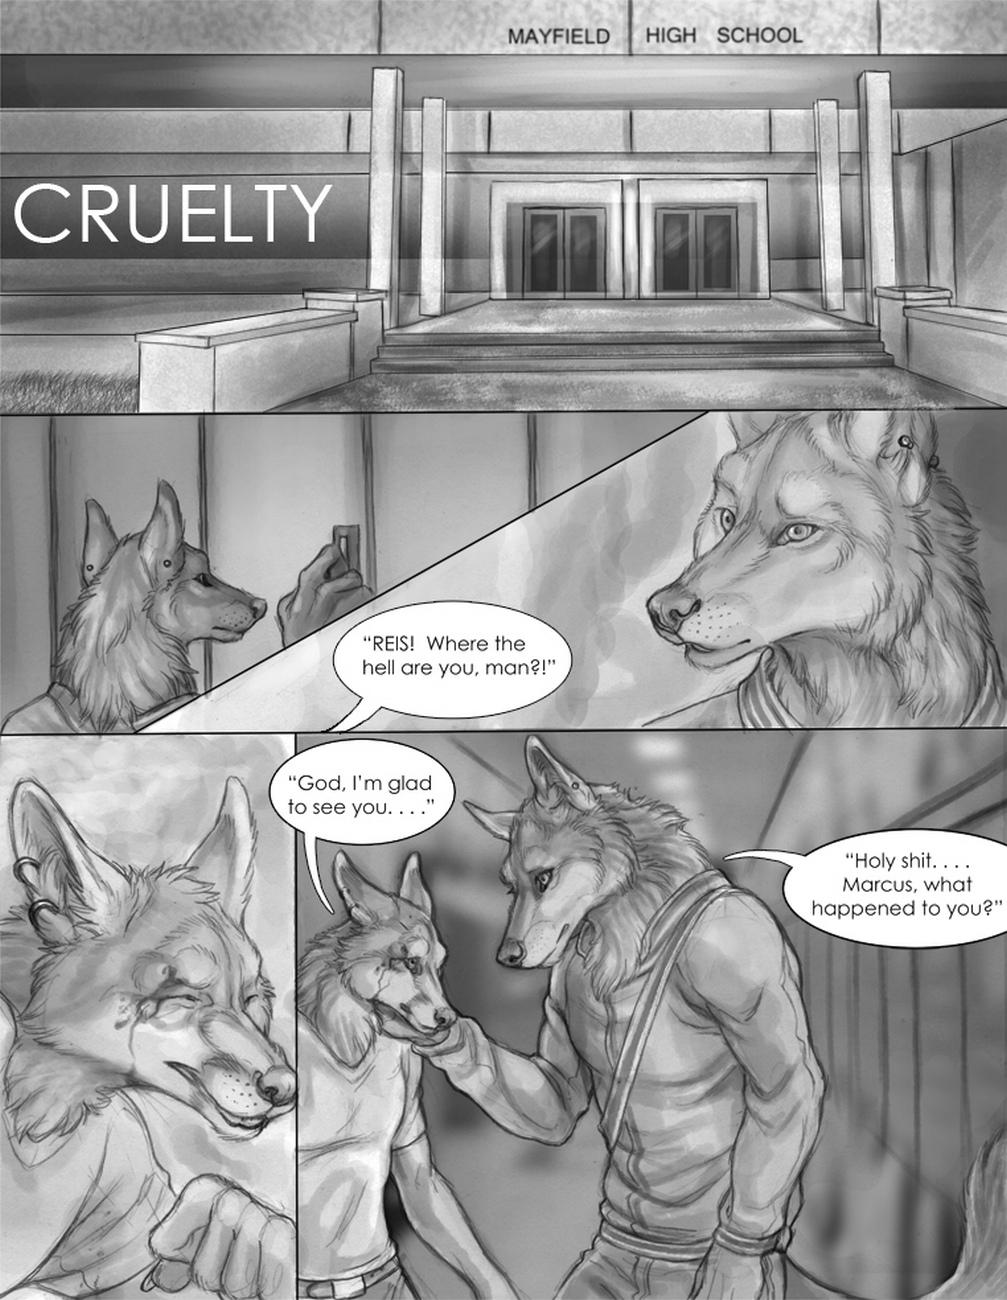 Cruelty 2 free sex comic